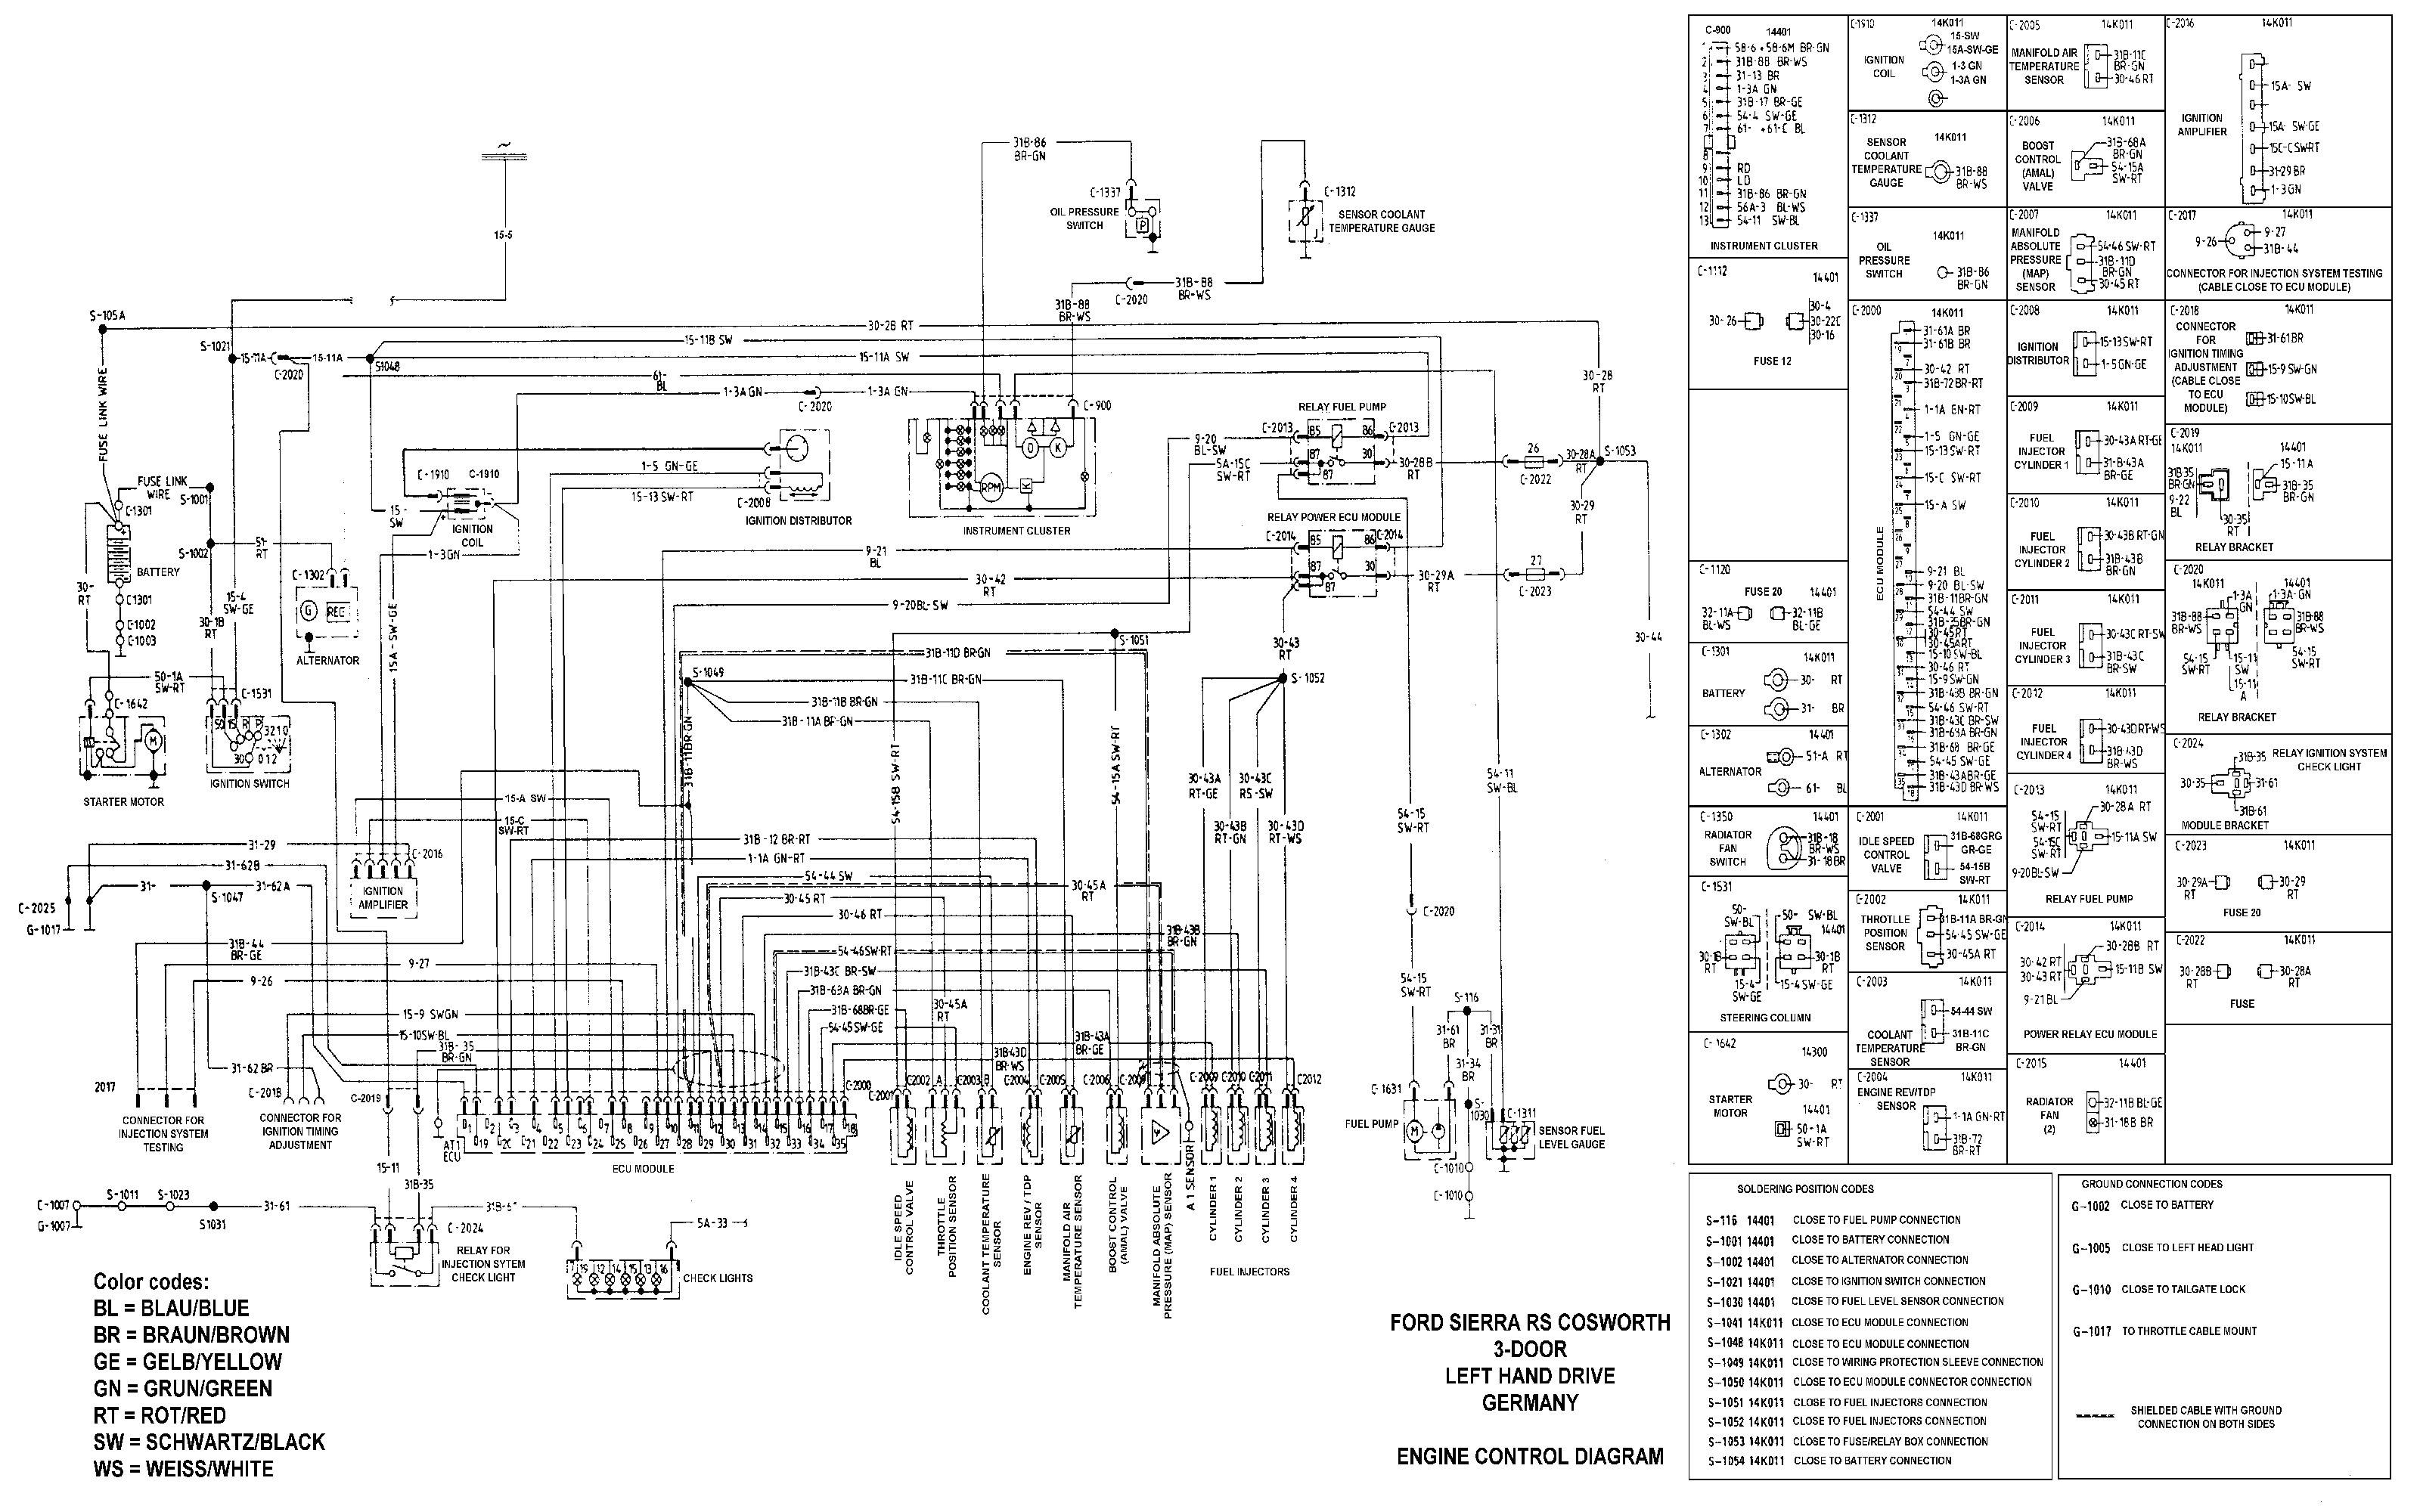 ford ka wiring diagram wiring diagram datasource ford ka wiring diagram free wiring diagram filter ford